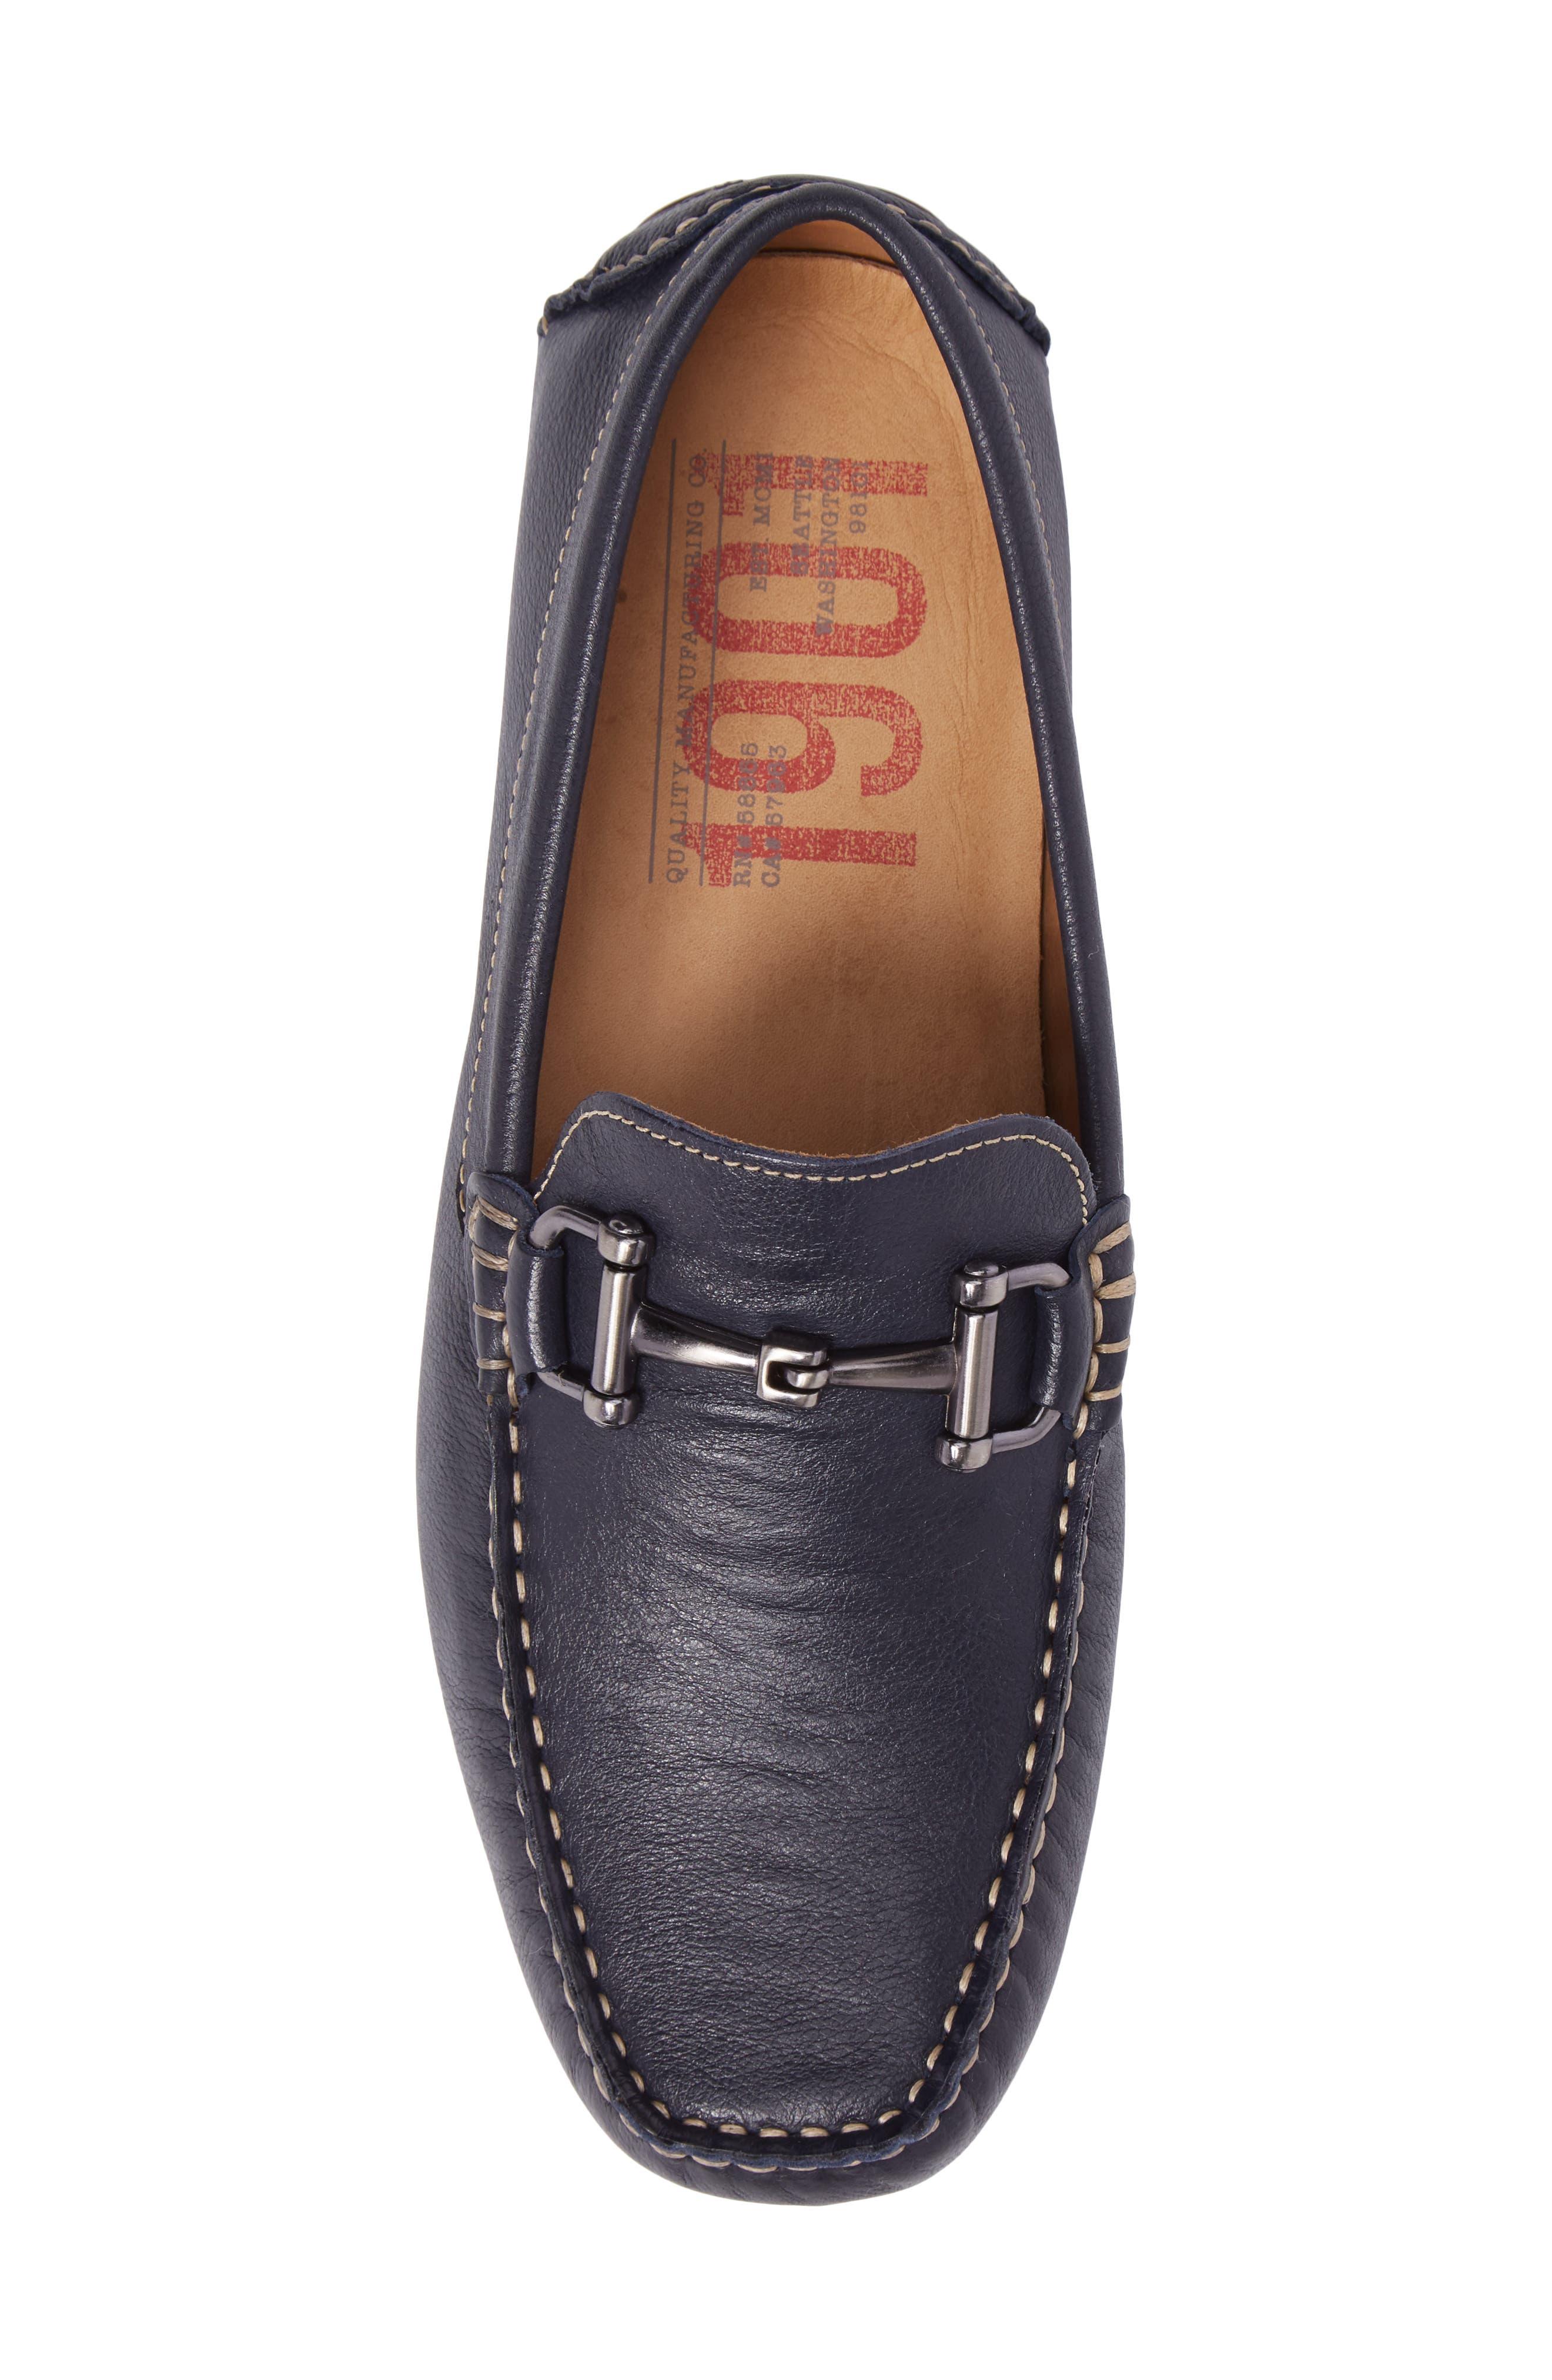 Topanga Driving Shoe,                             Alternate thumbnail 5, color,                             Navy Leather